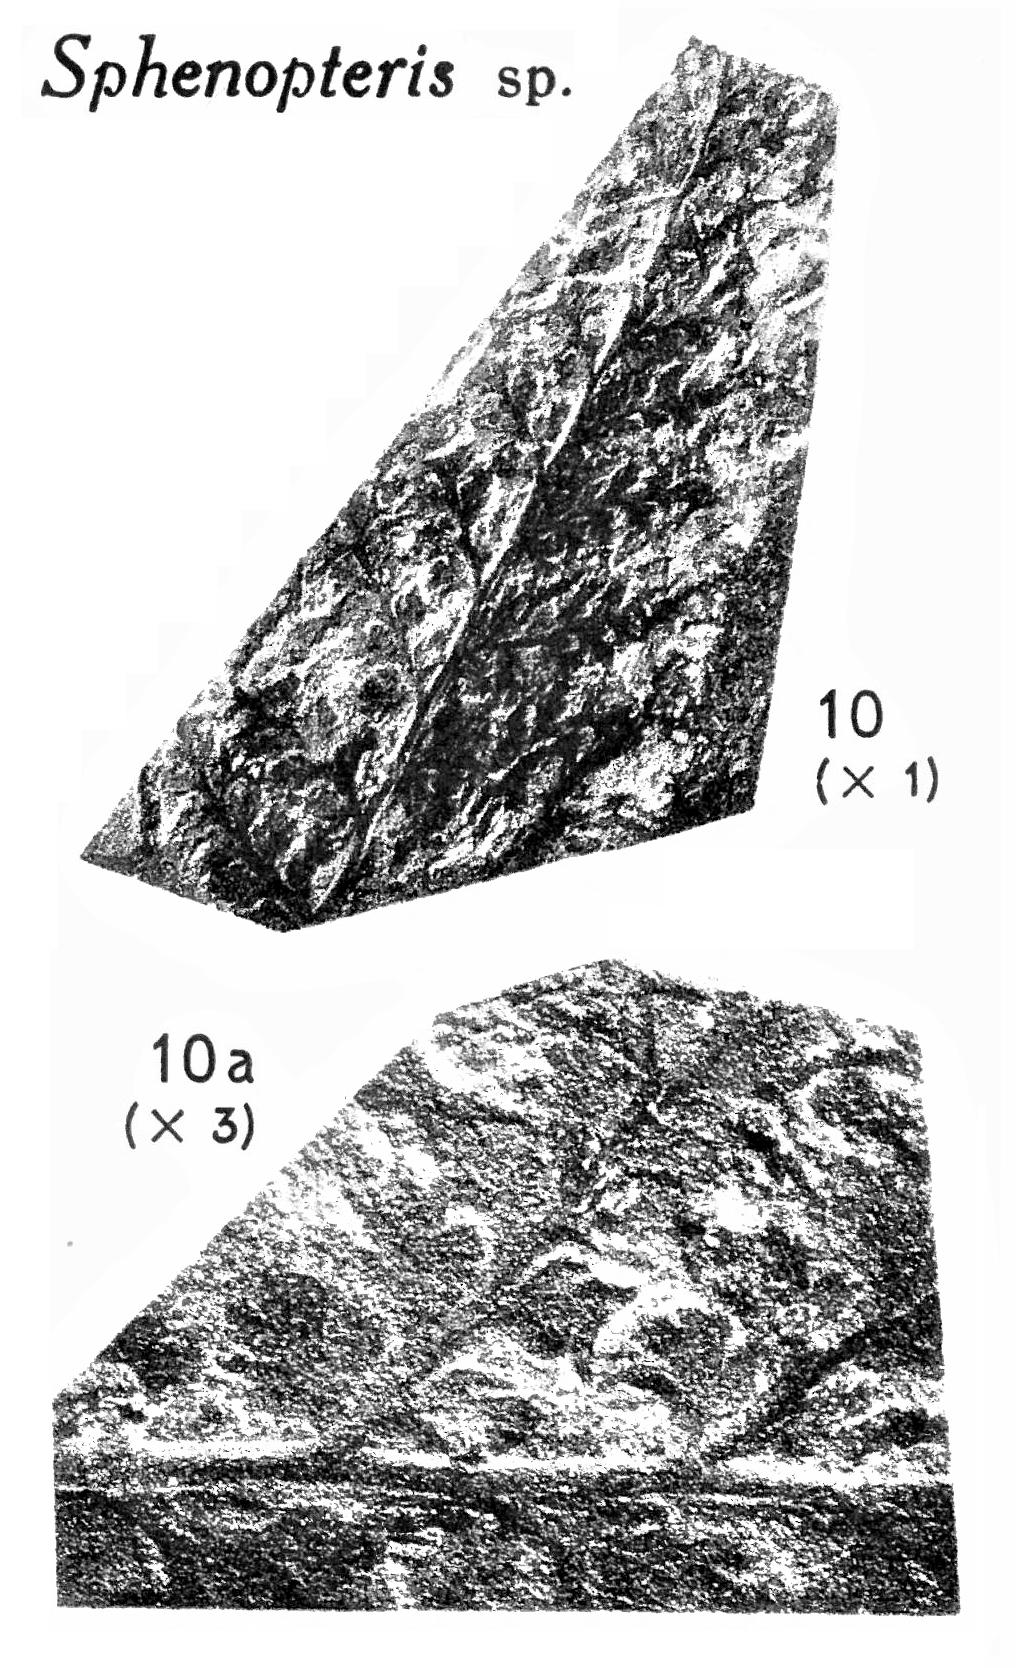 Pl. II ; Fig 10, 10a